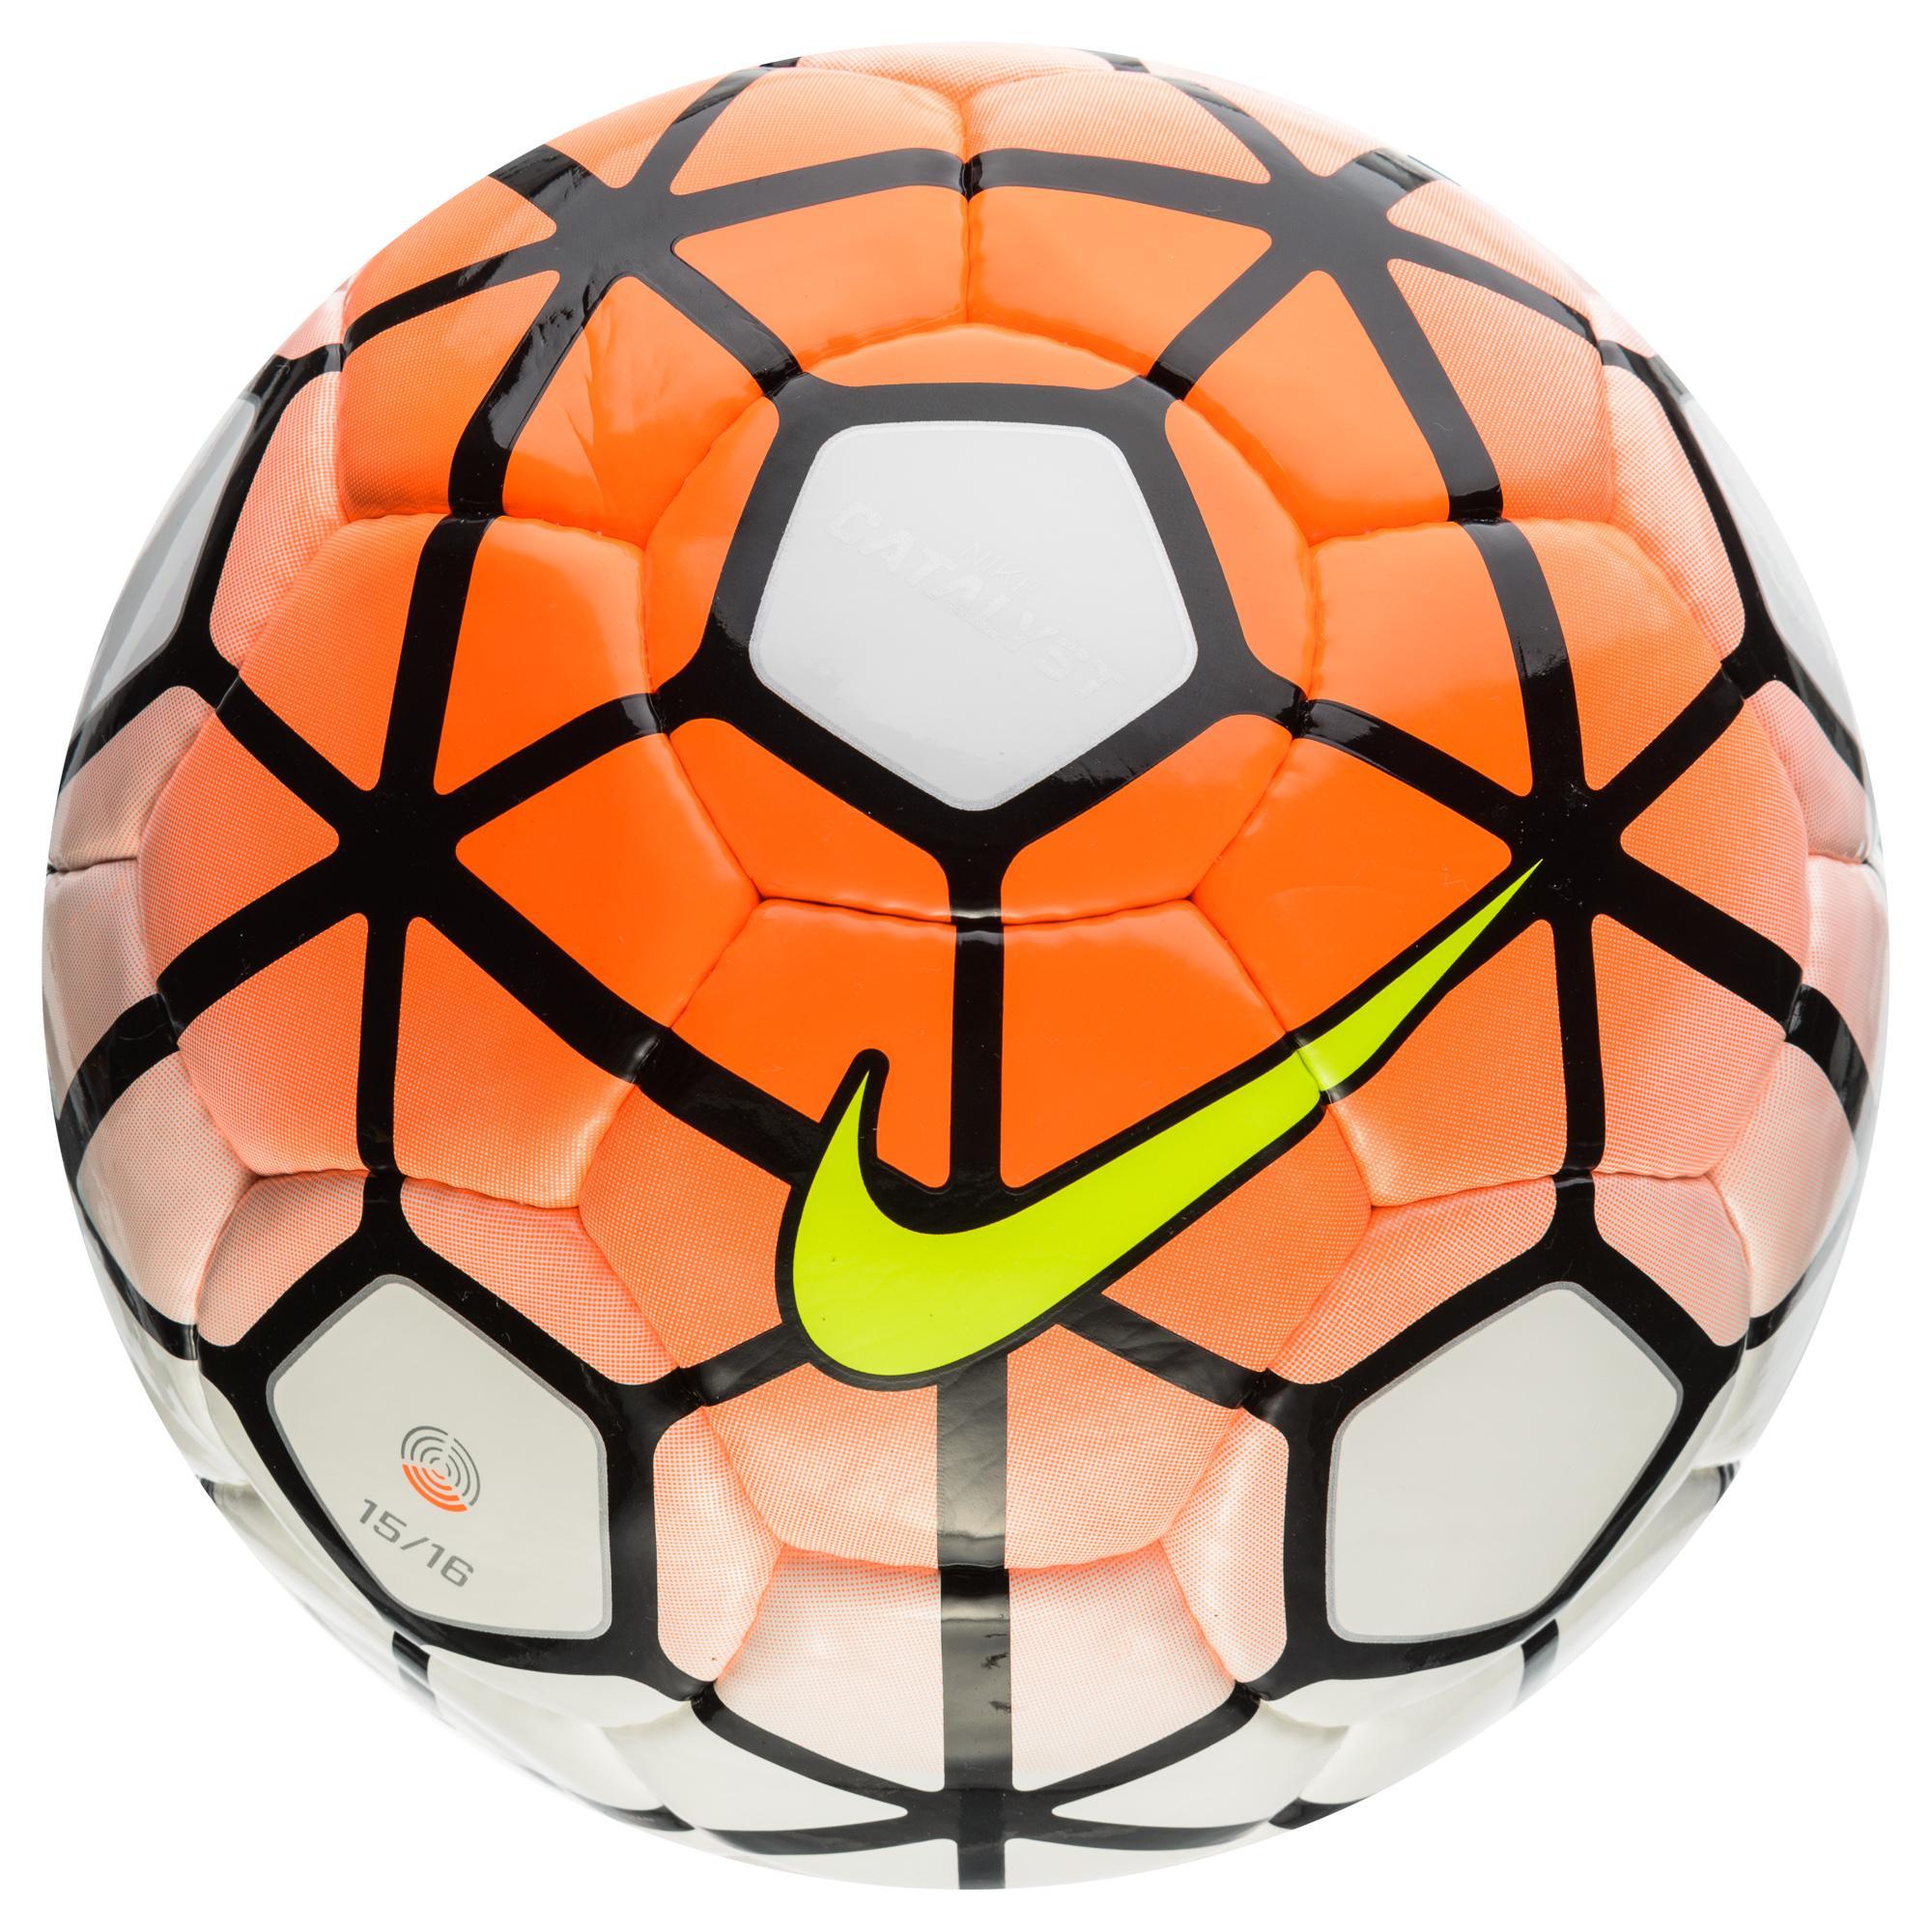 Nike Fotboll Catalyst Vit/Orange/Svart